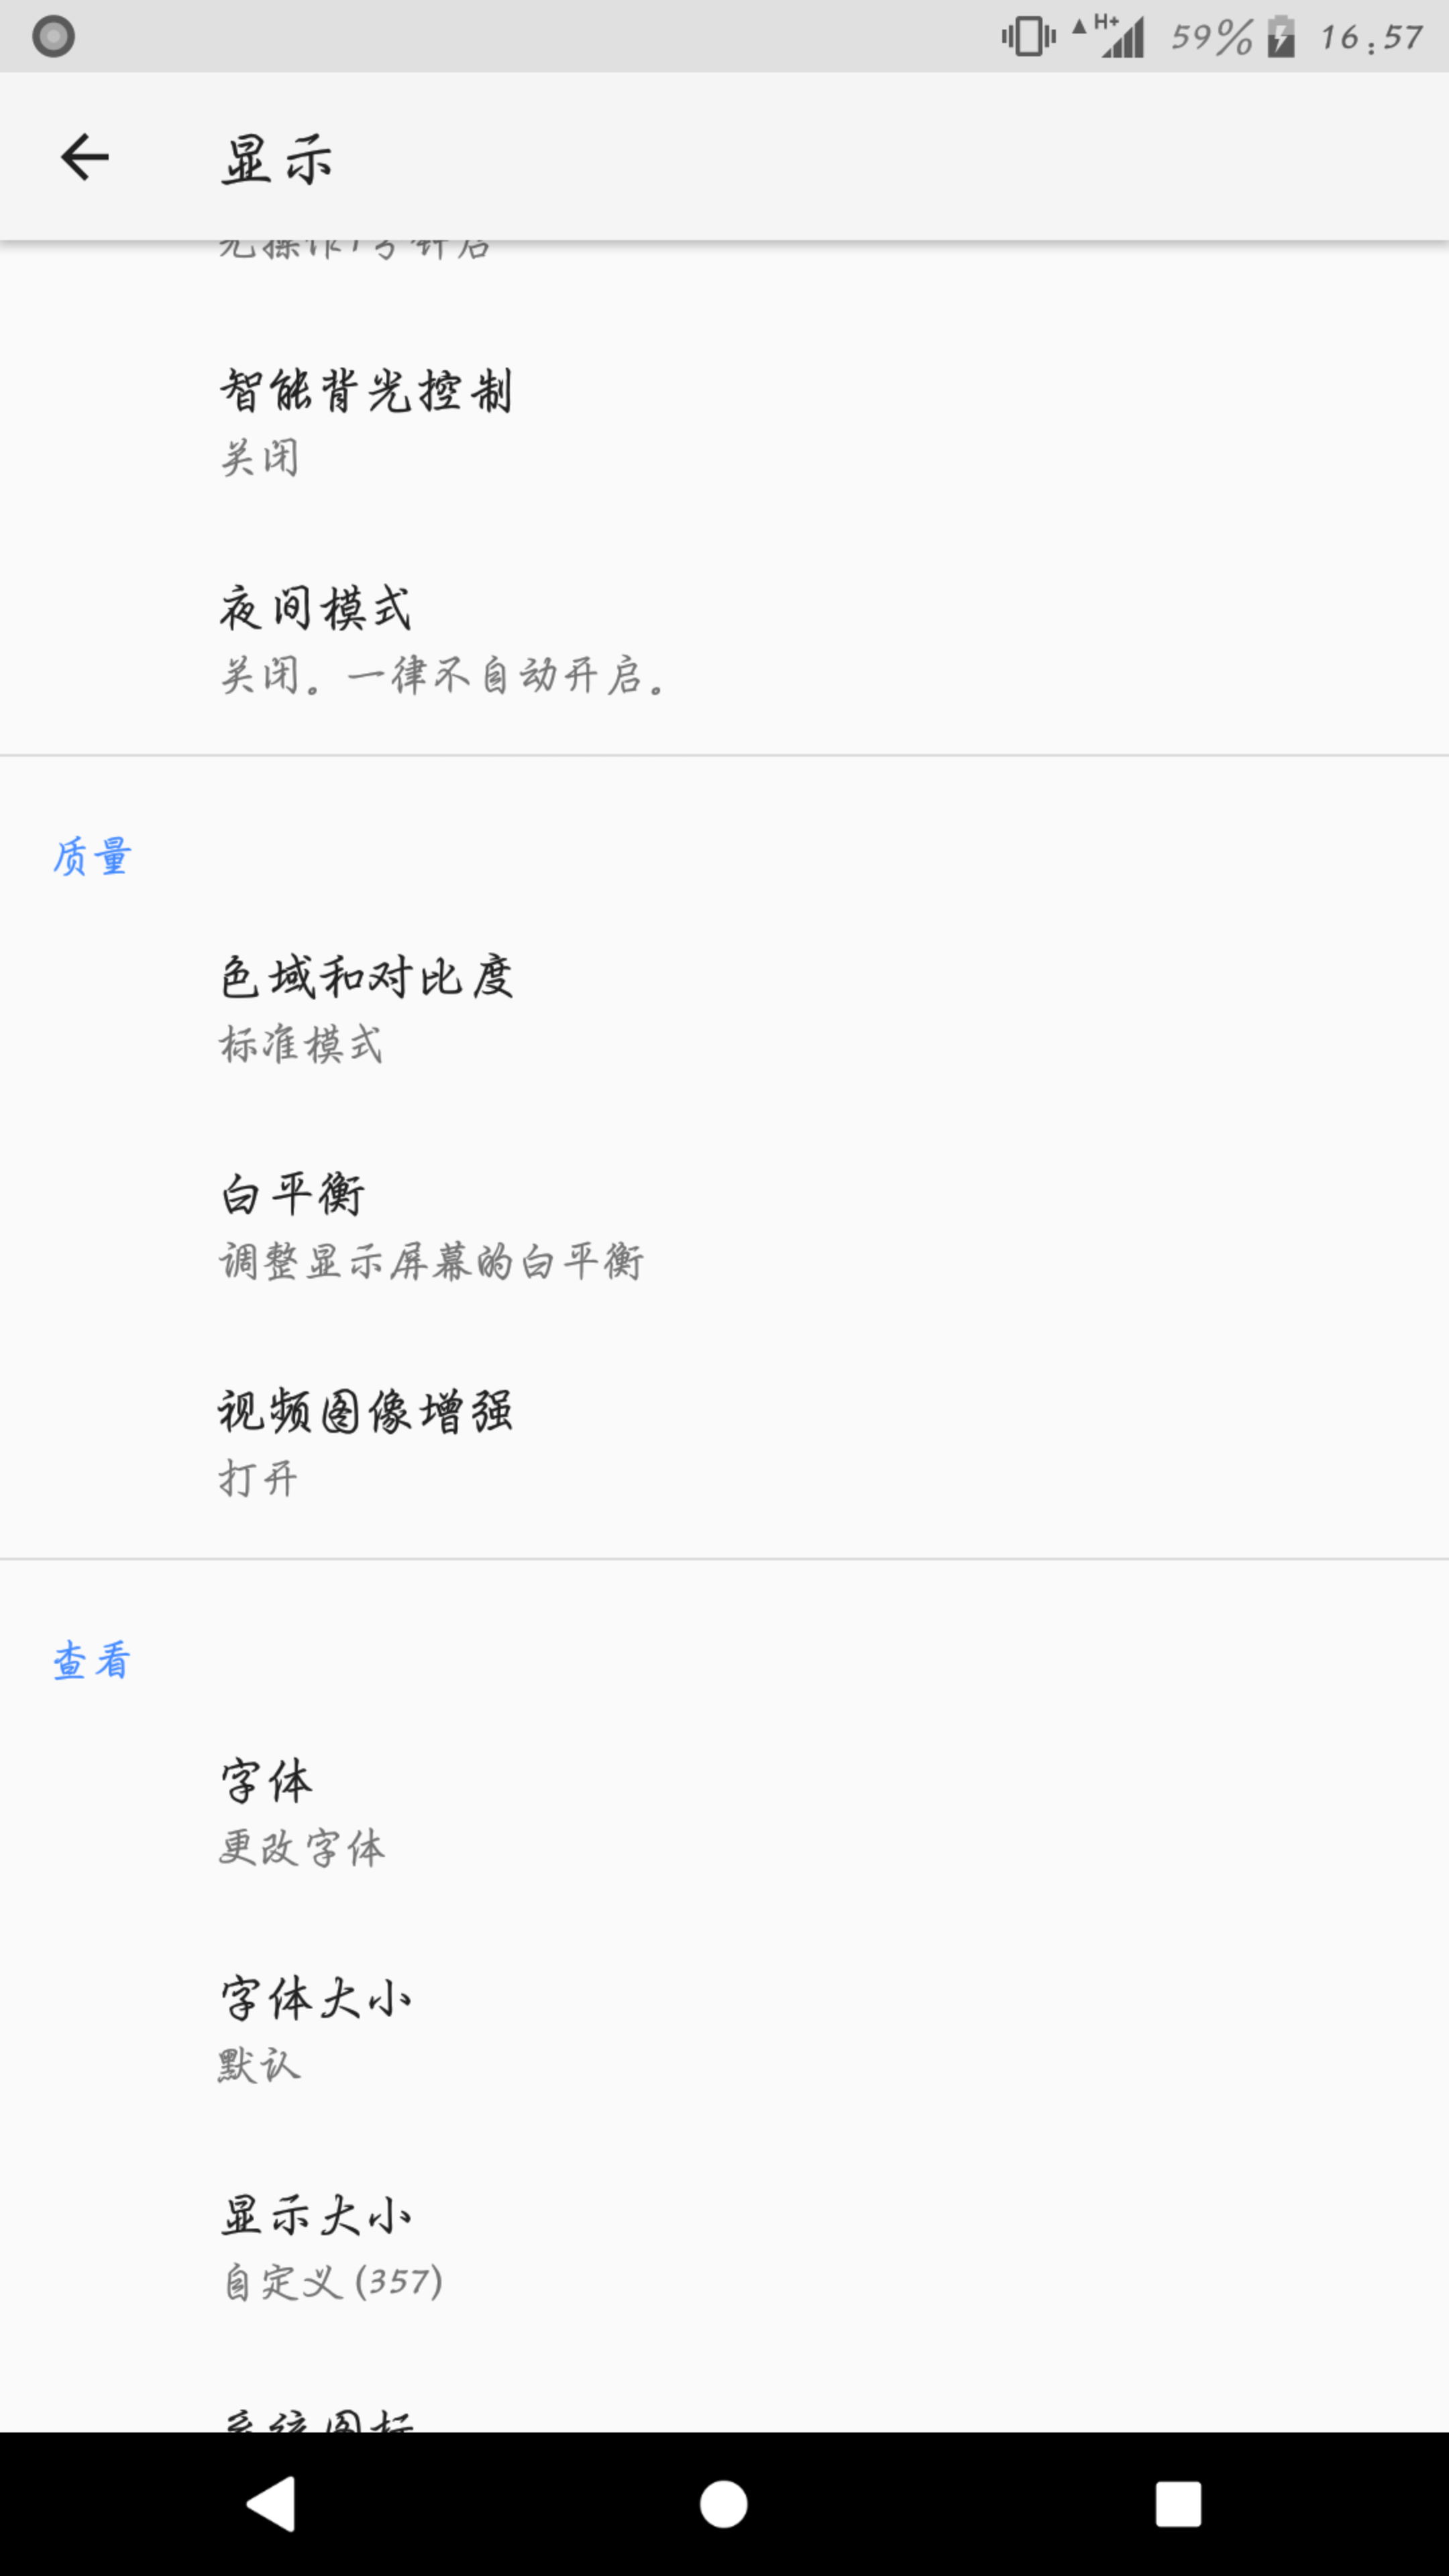 Screenshot_20180123-165754.png